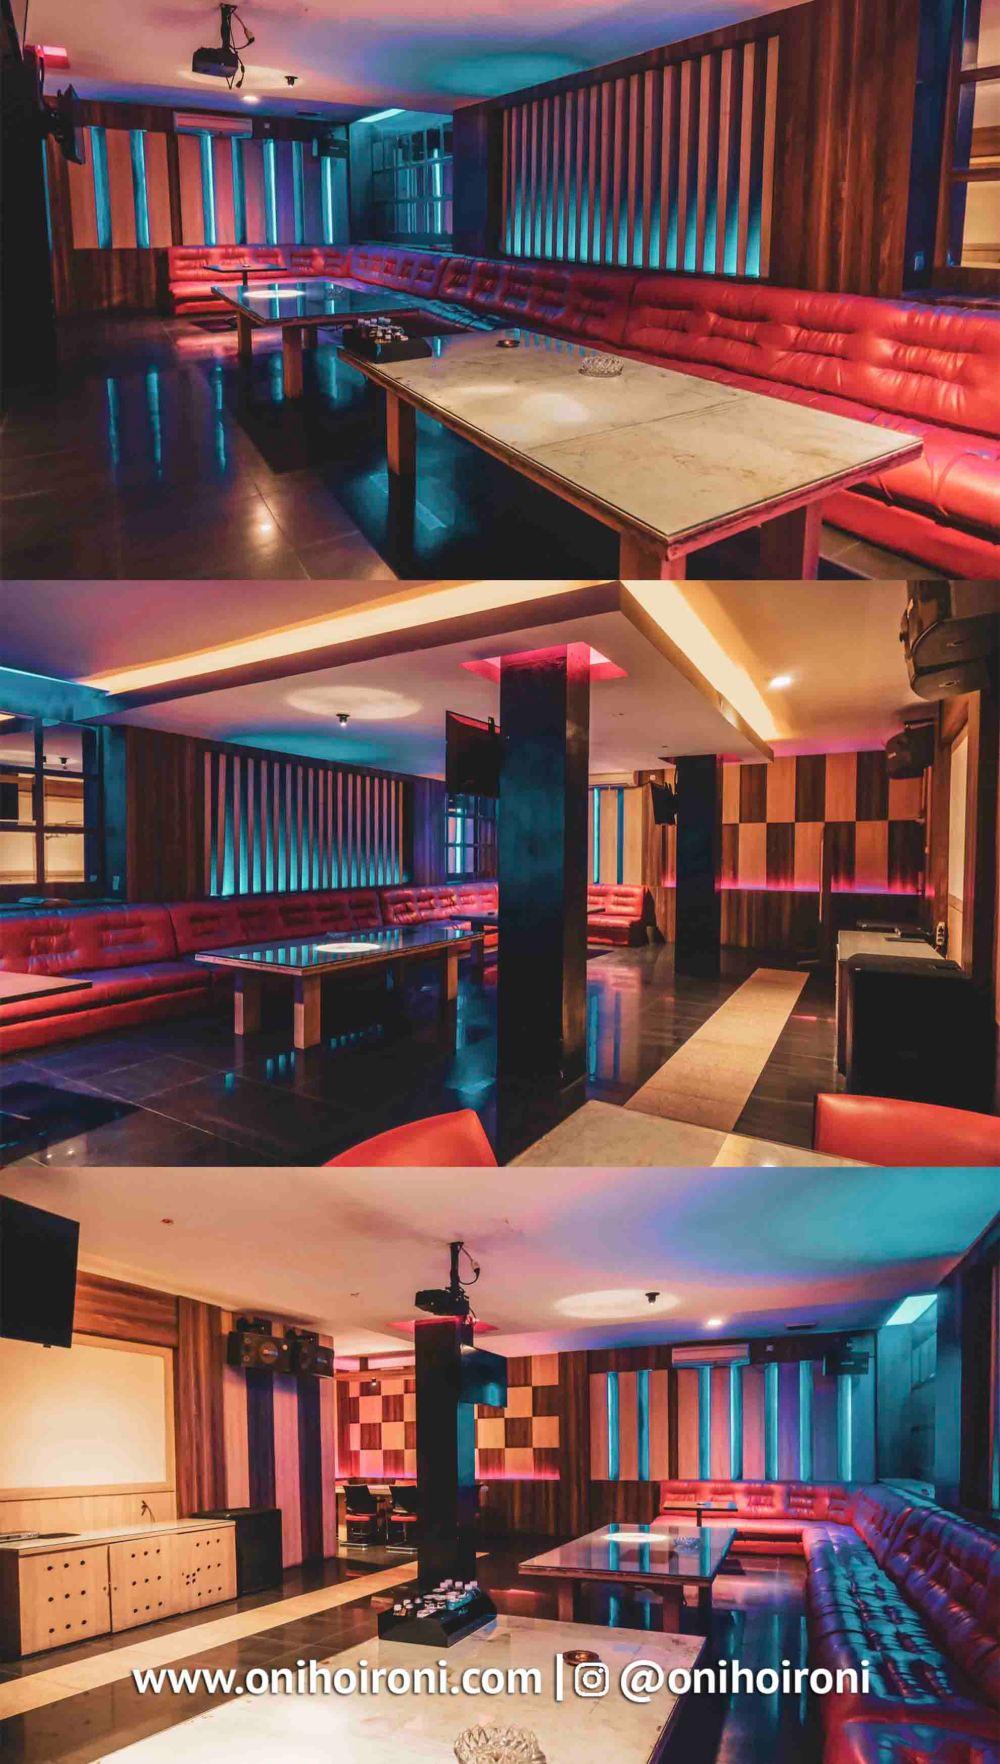 Karaoke M One Hotel Sentul Bogor, Onihoironi.jpg